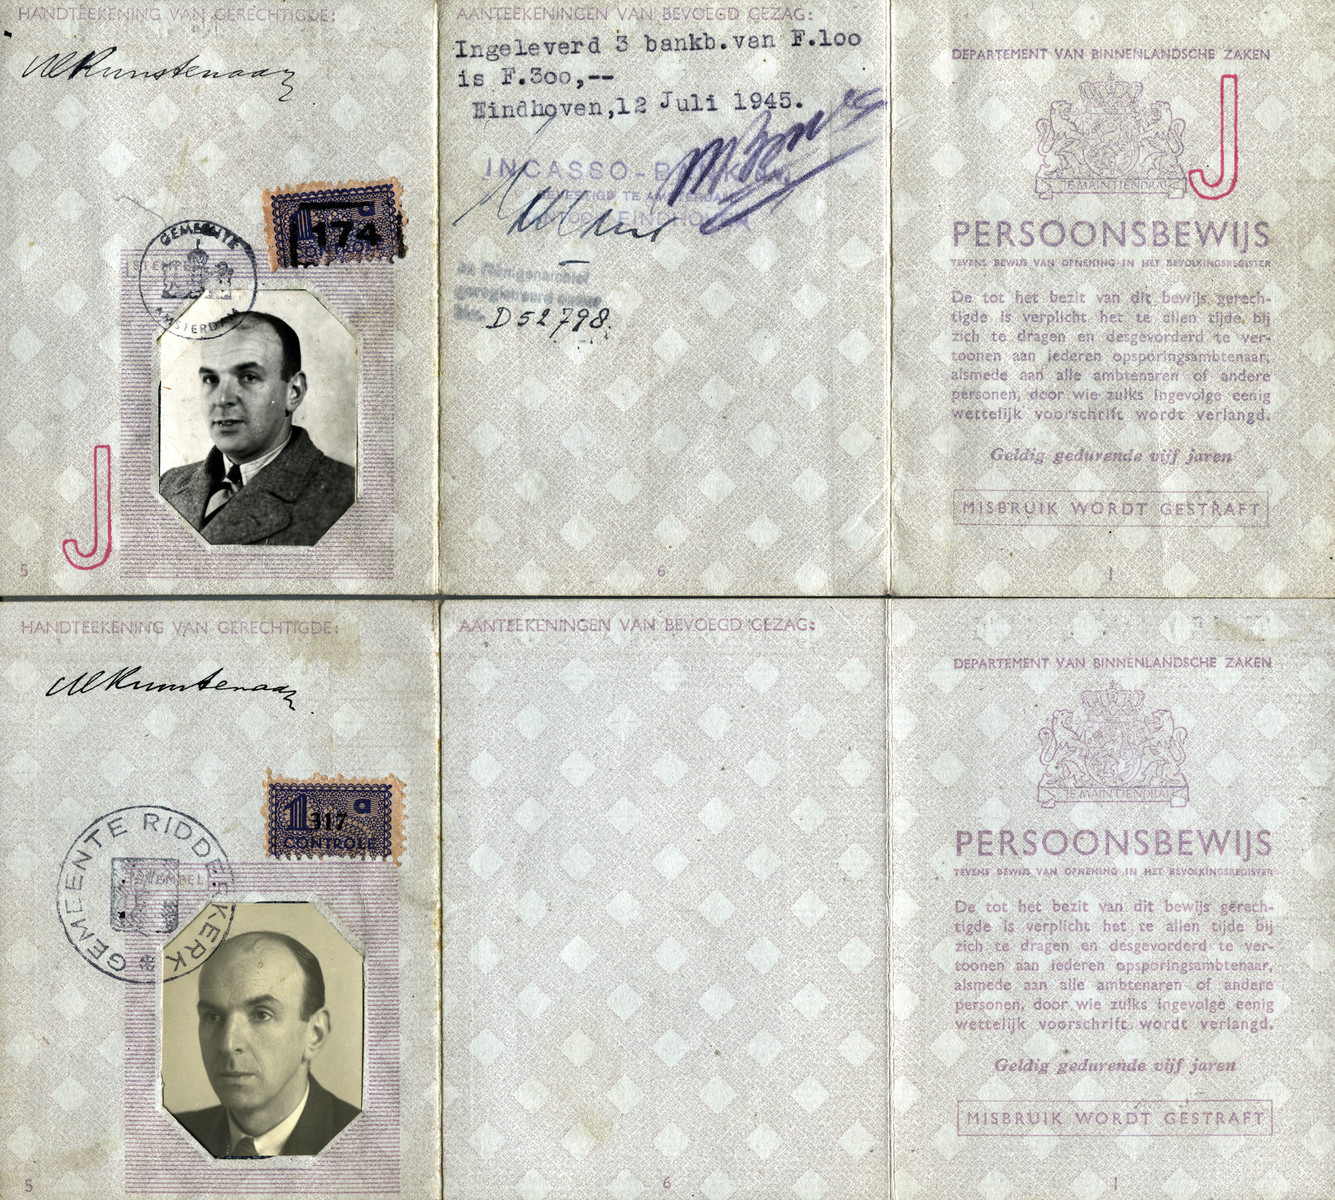 Identification card of Marion Kunstenaar's father, Michel Kunstenaar, marked with a J.